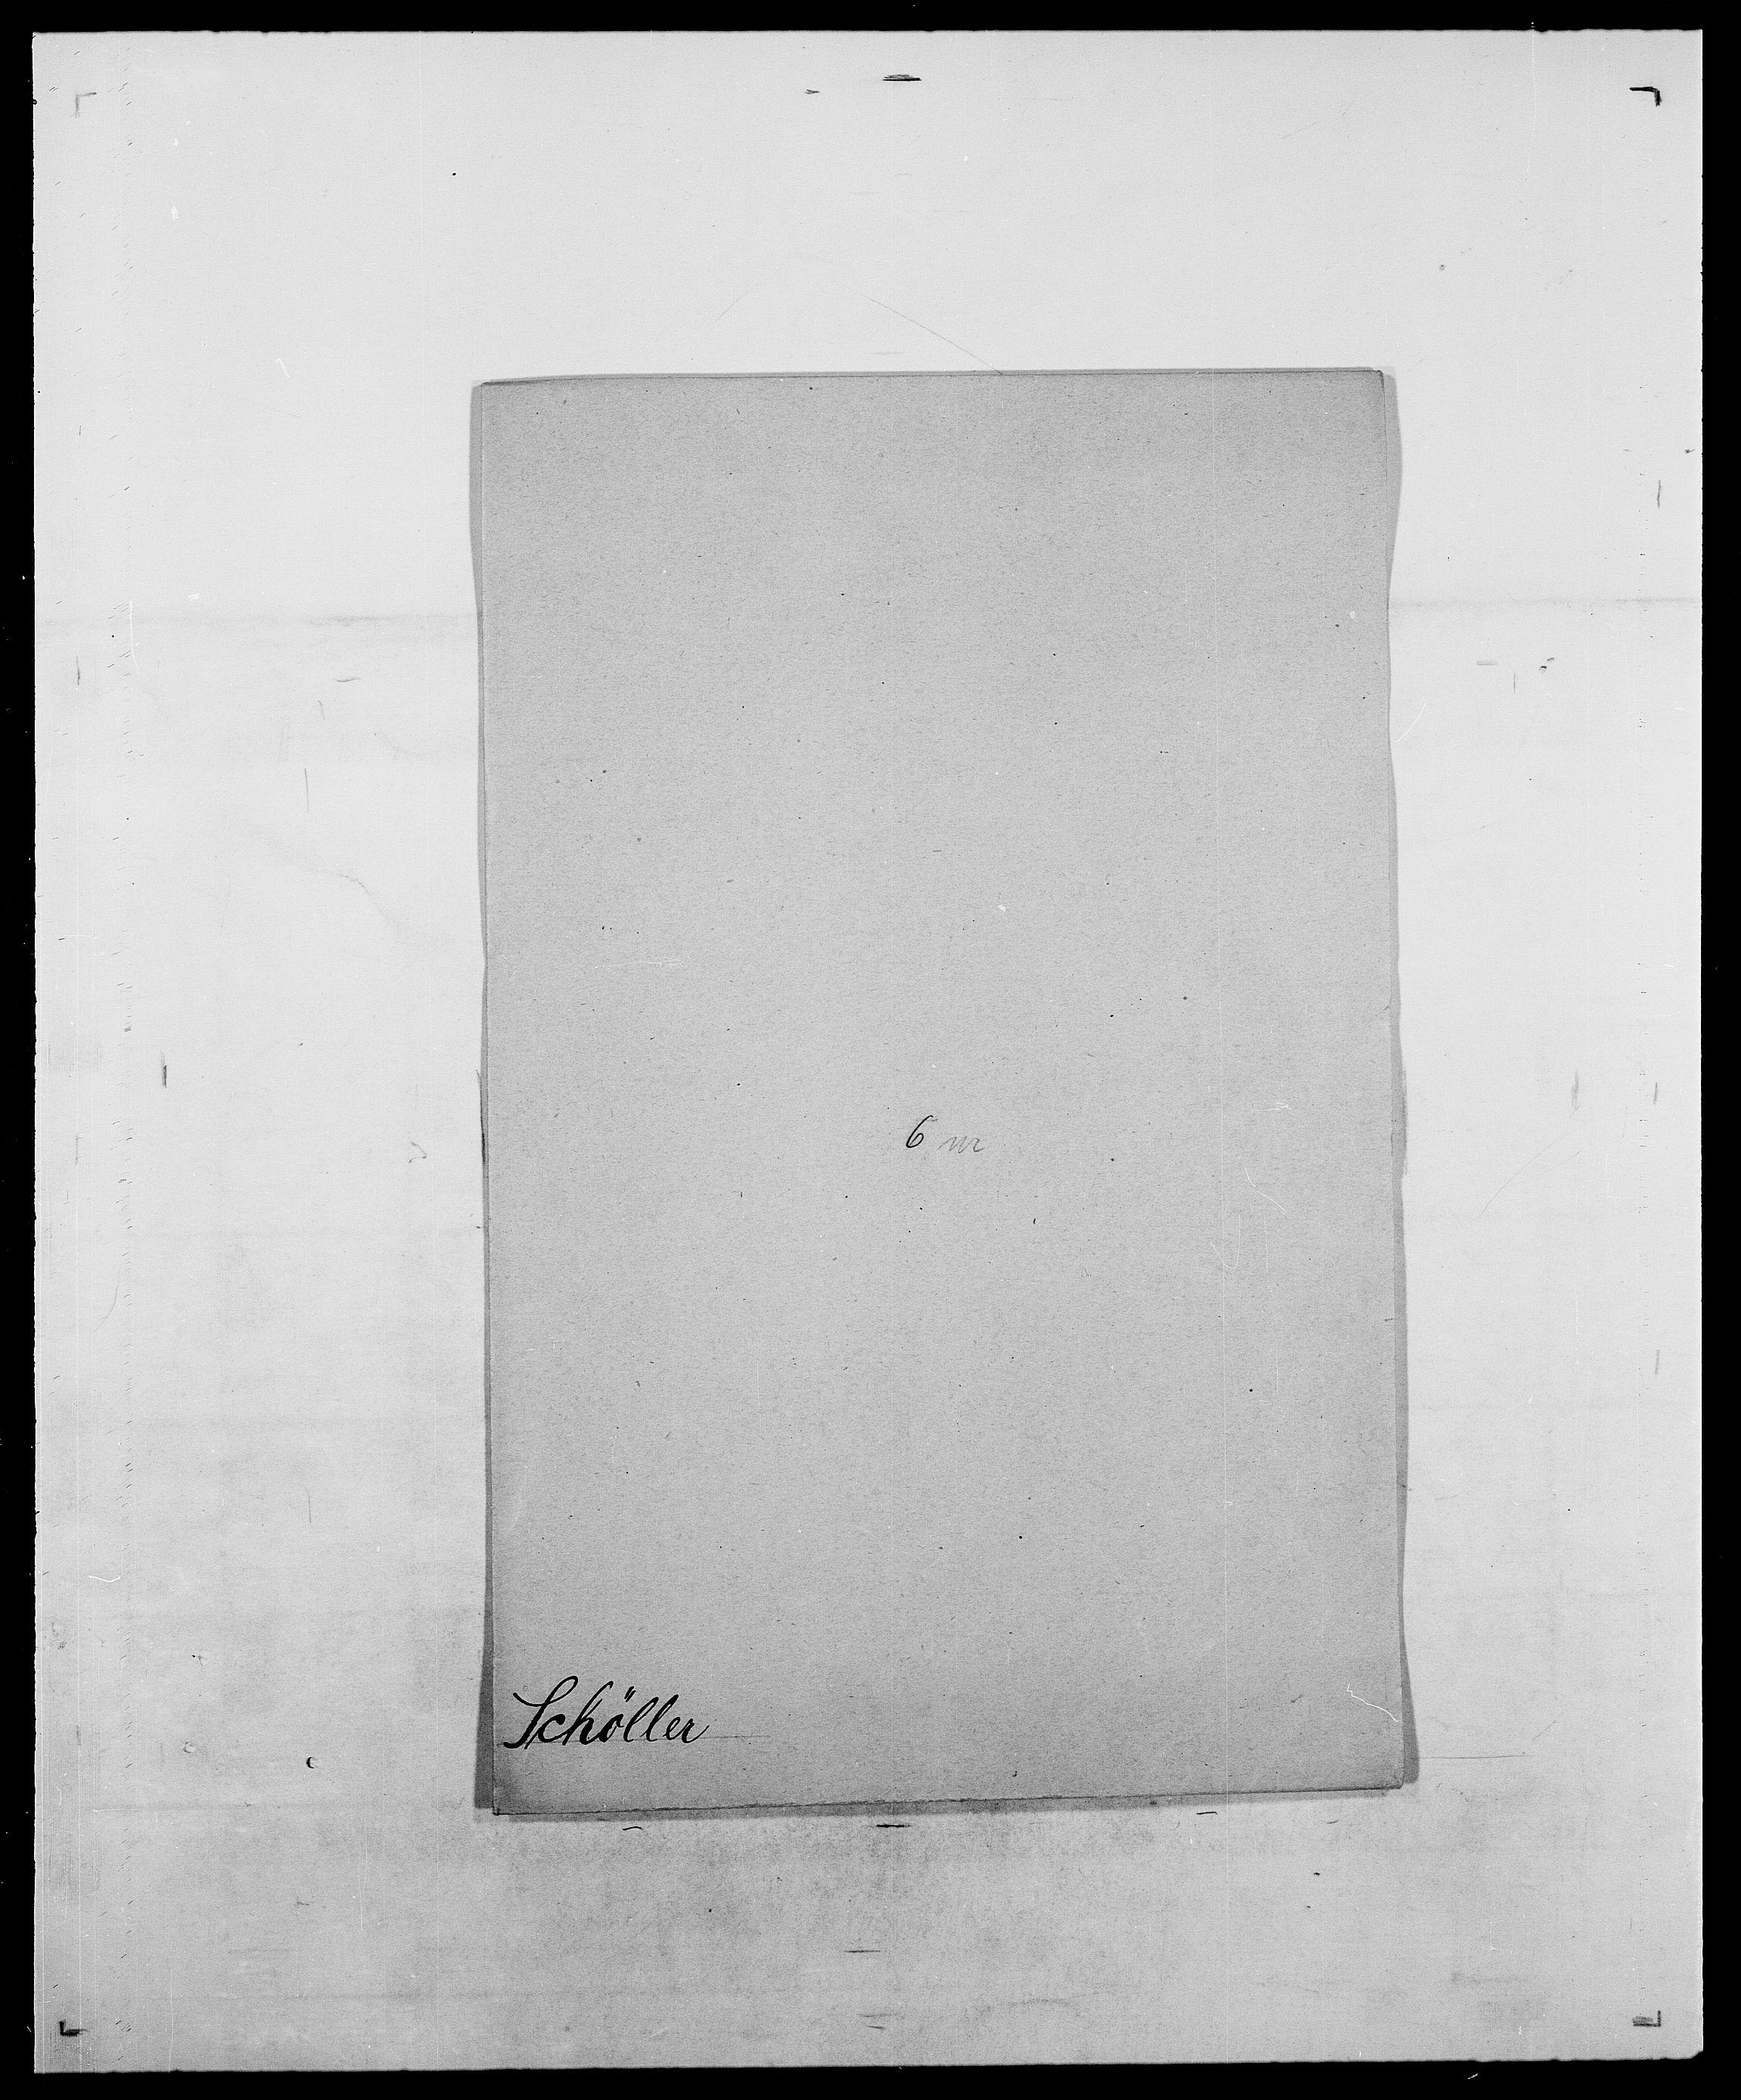 SAO, Delgobe, Charles Antoine - samling, D/Da/L0035: Schnabel - sjetman, s. 454